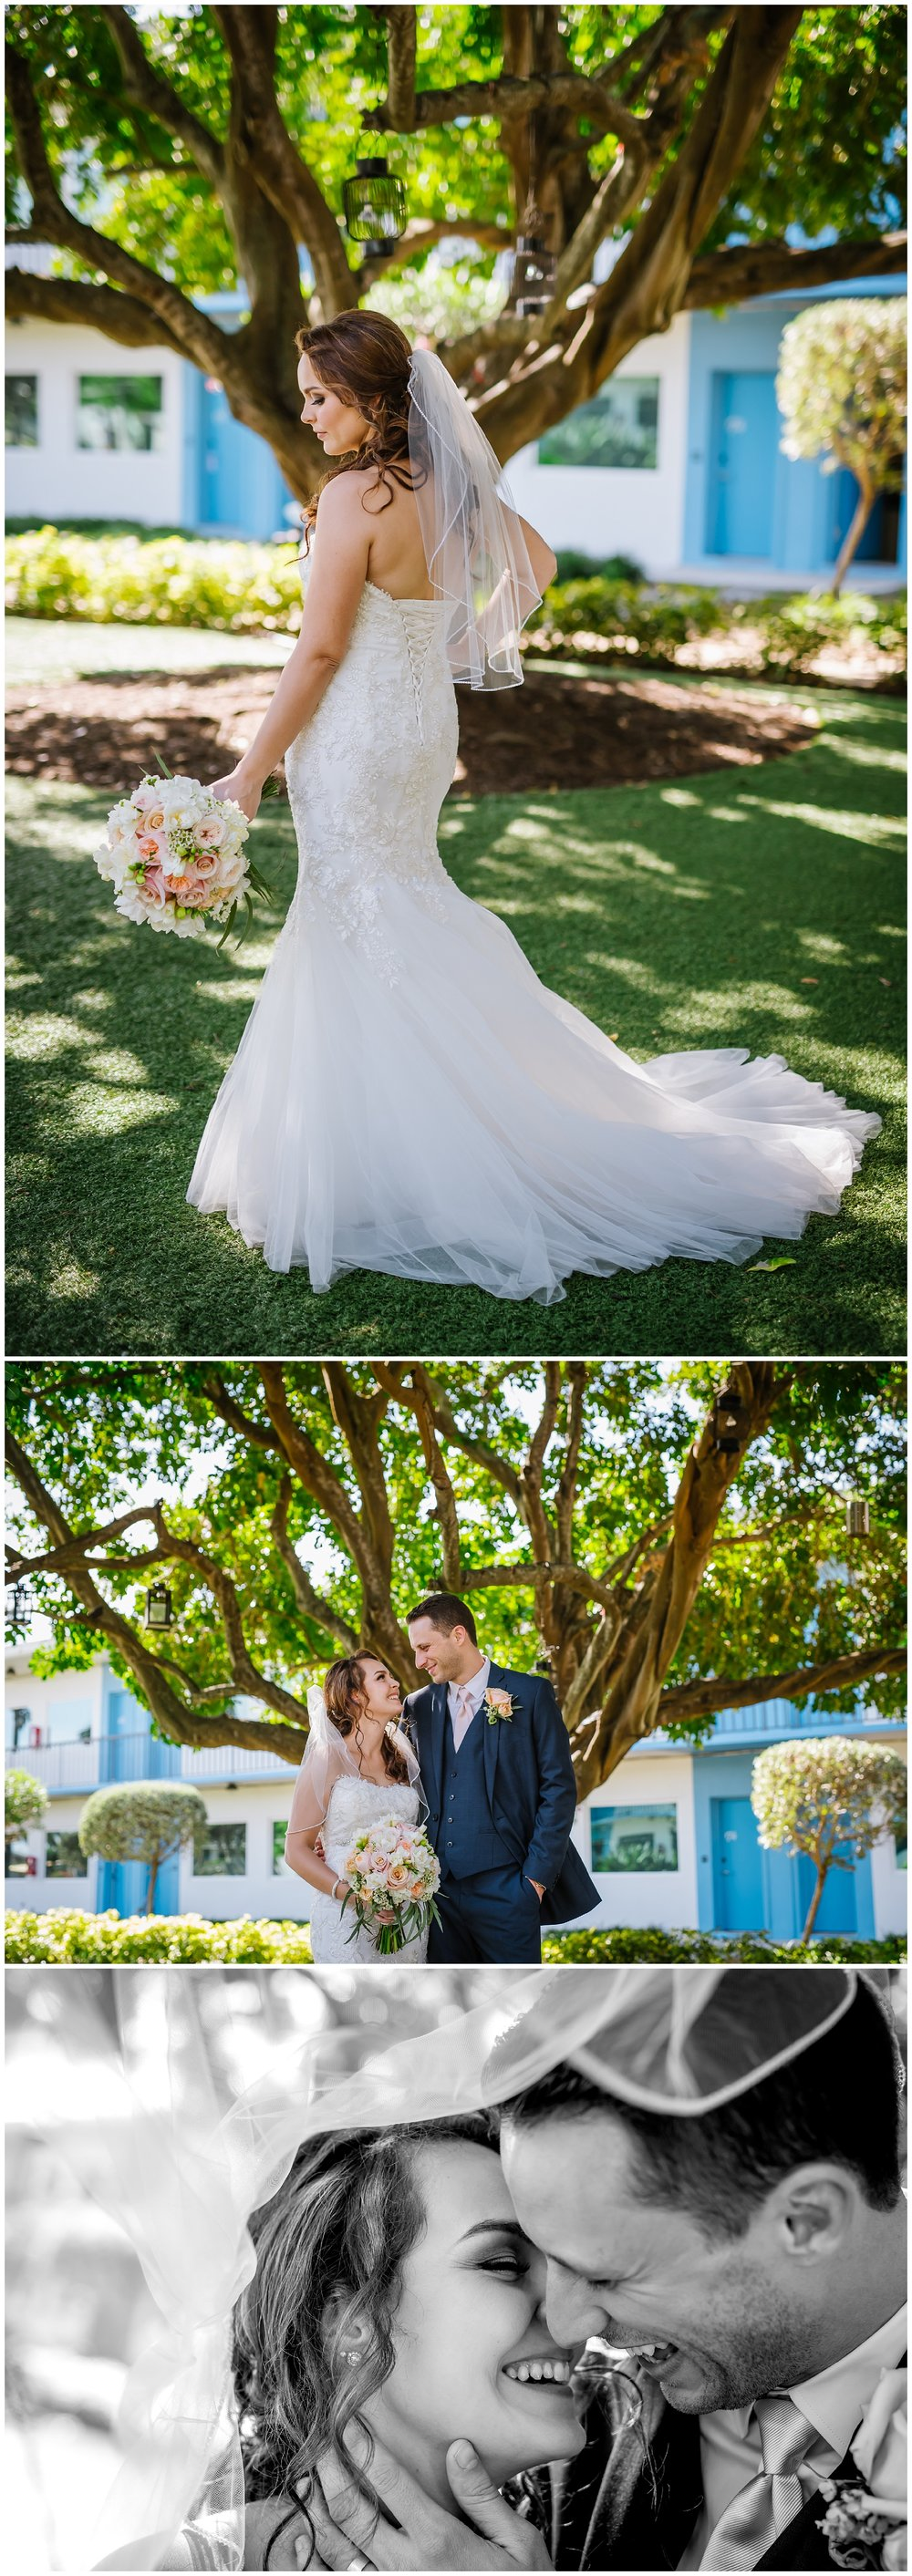 Ashlee-hamon-photography-year-in-review-2016-travel-wanderlust-vsco-adventure-wedding_0069.jpg